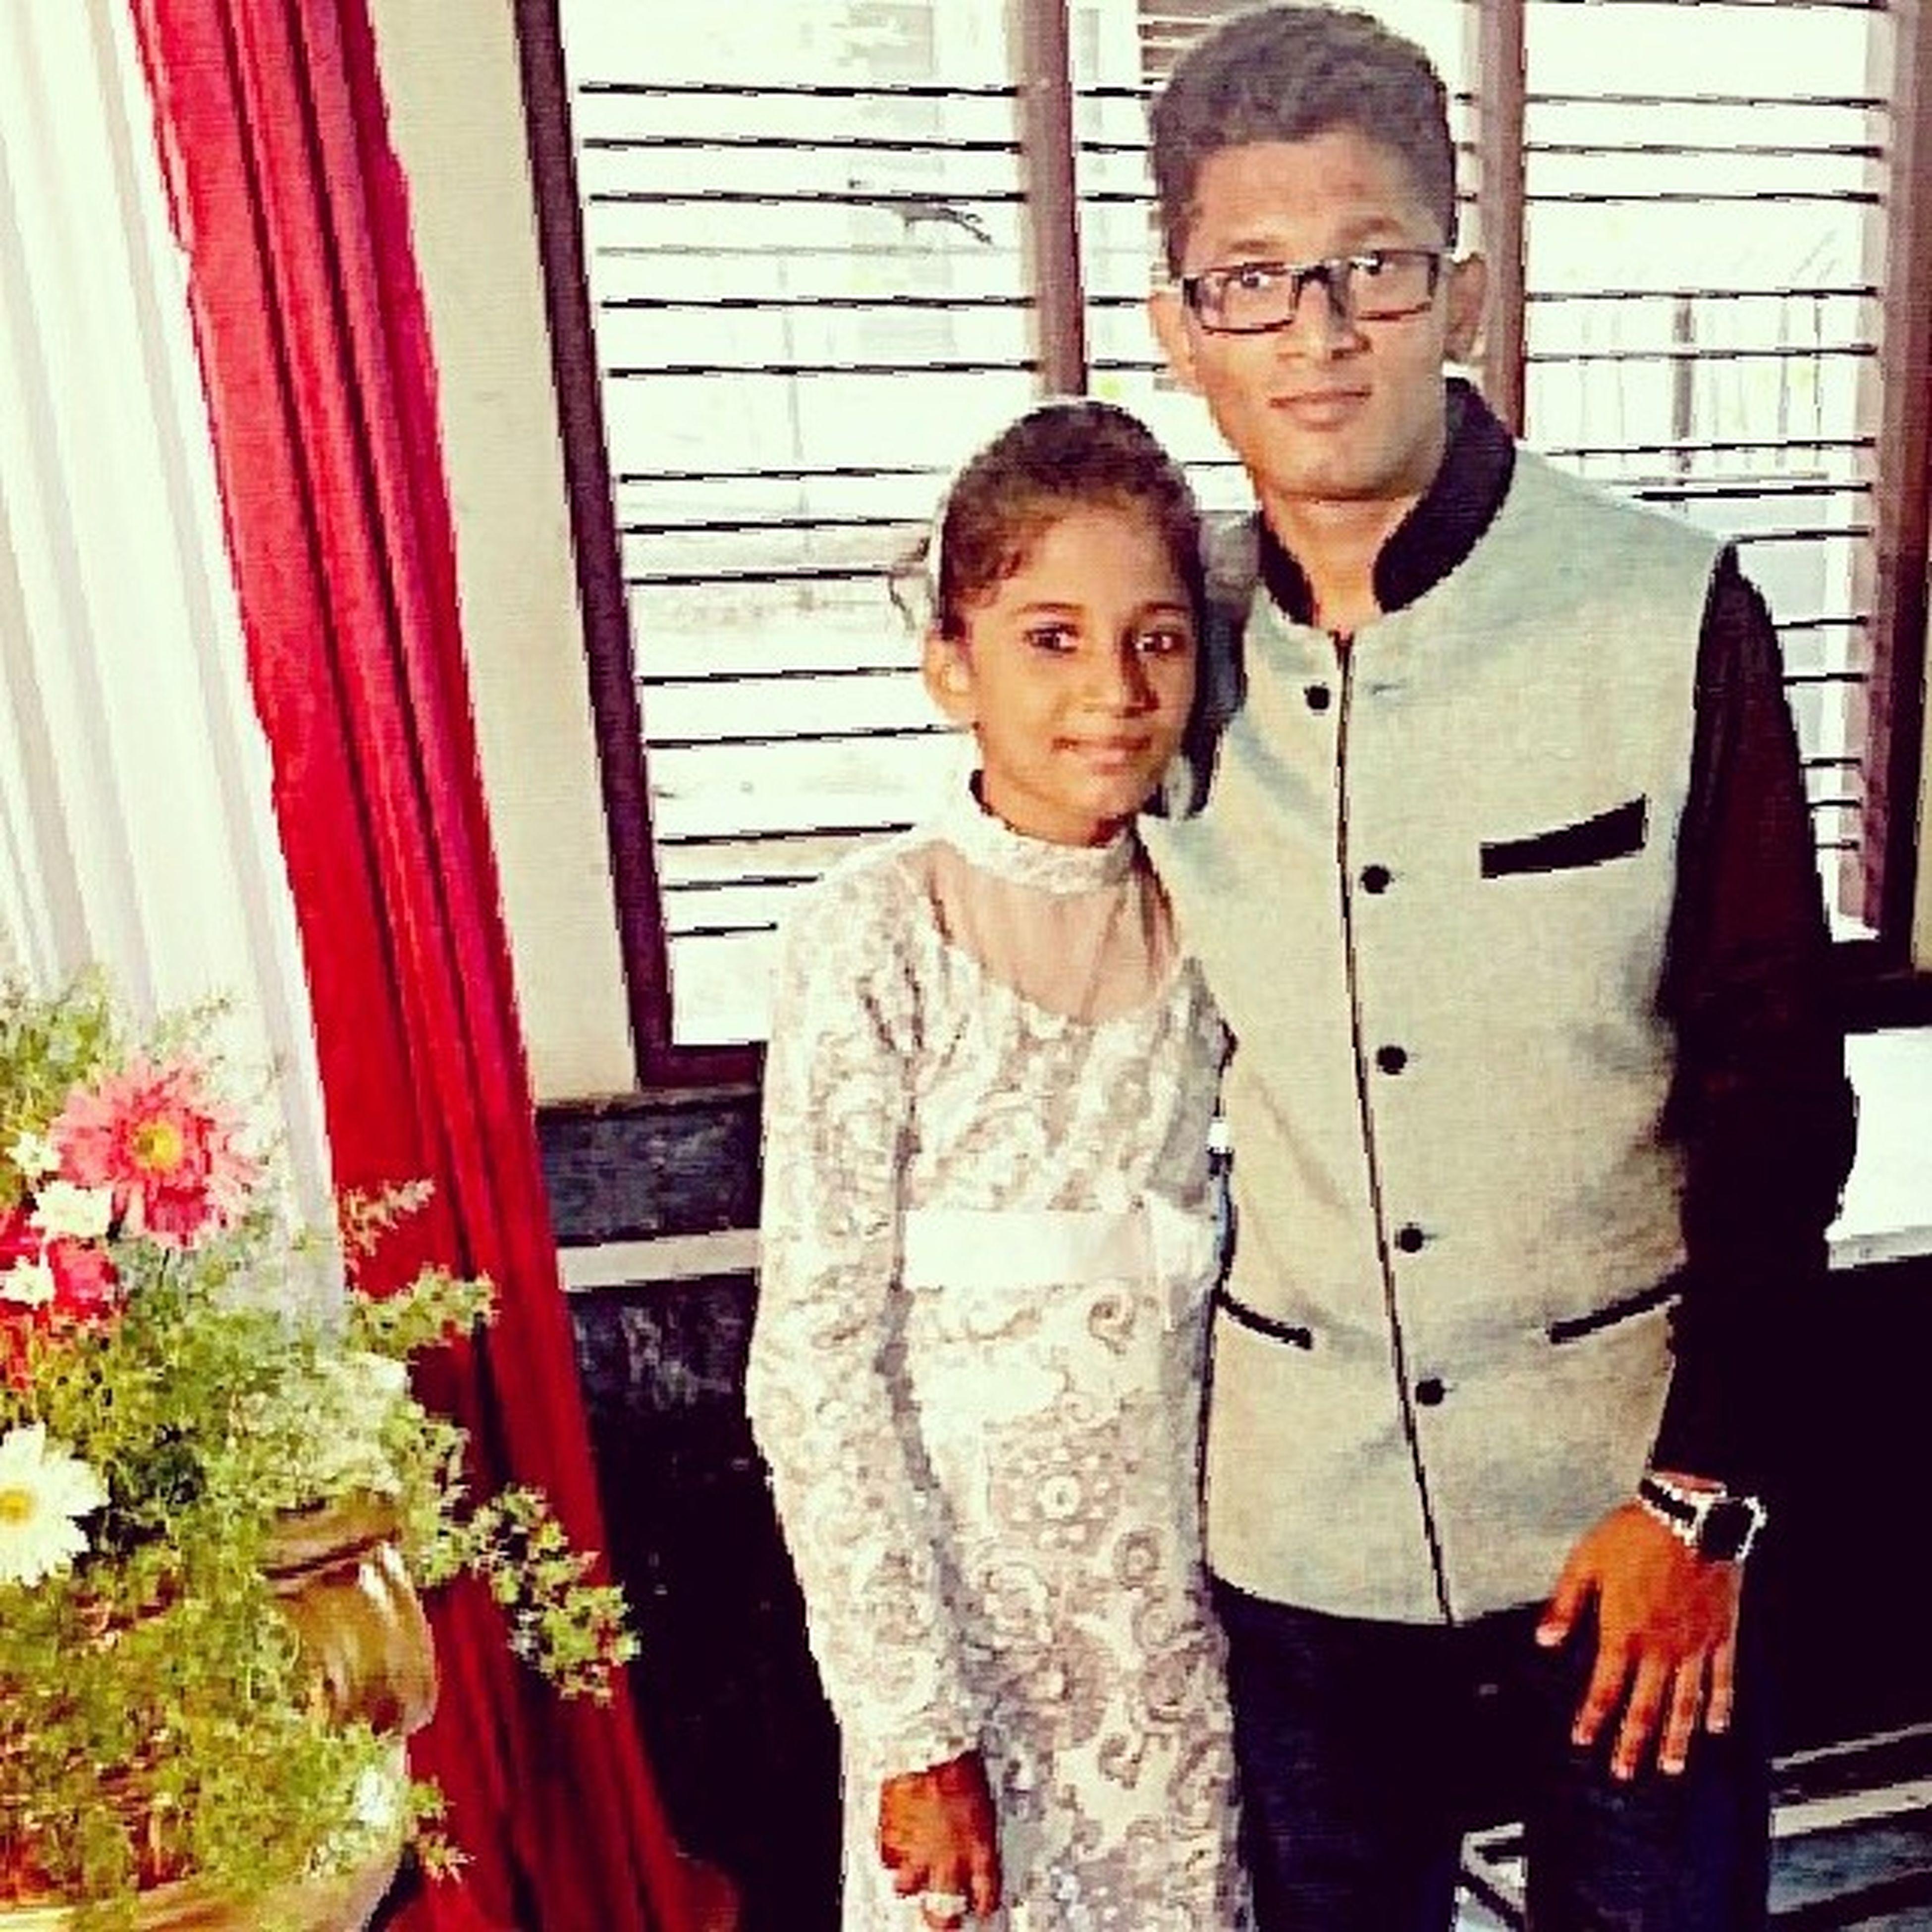 ♡cousins_wedding♡ ♡shadi_mahal♡ ♡with my sweet sis♡